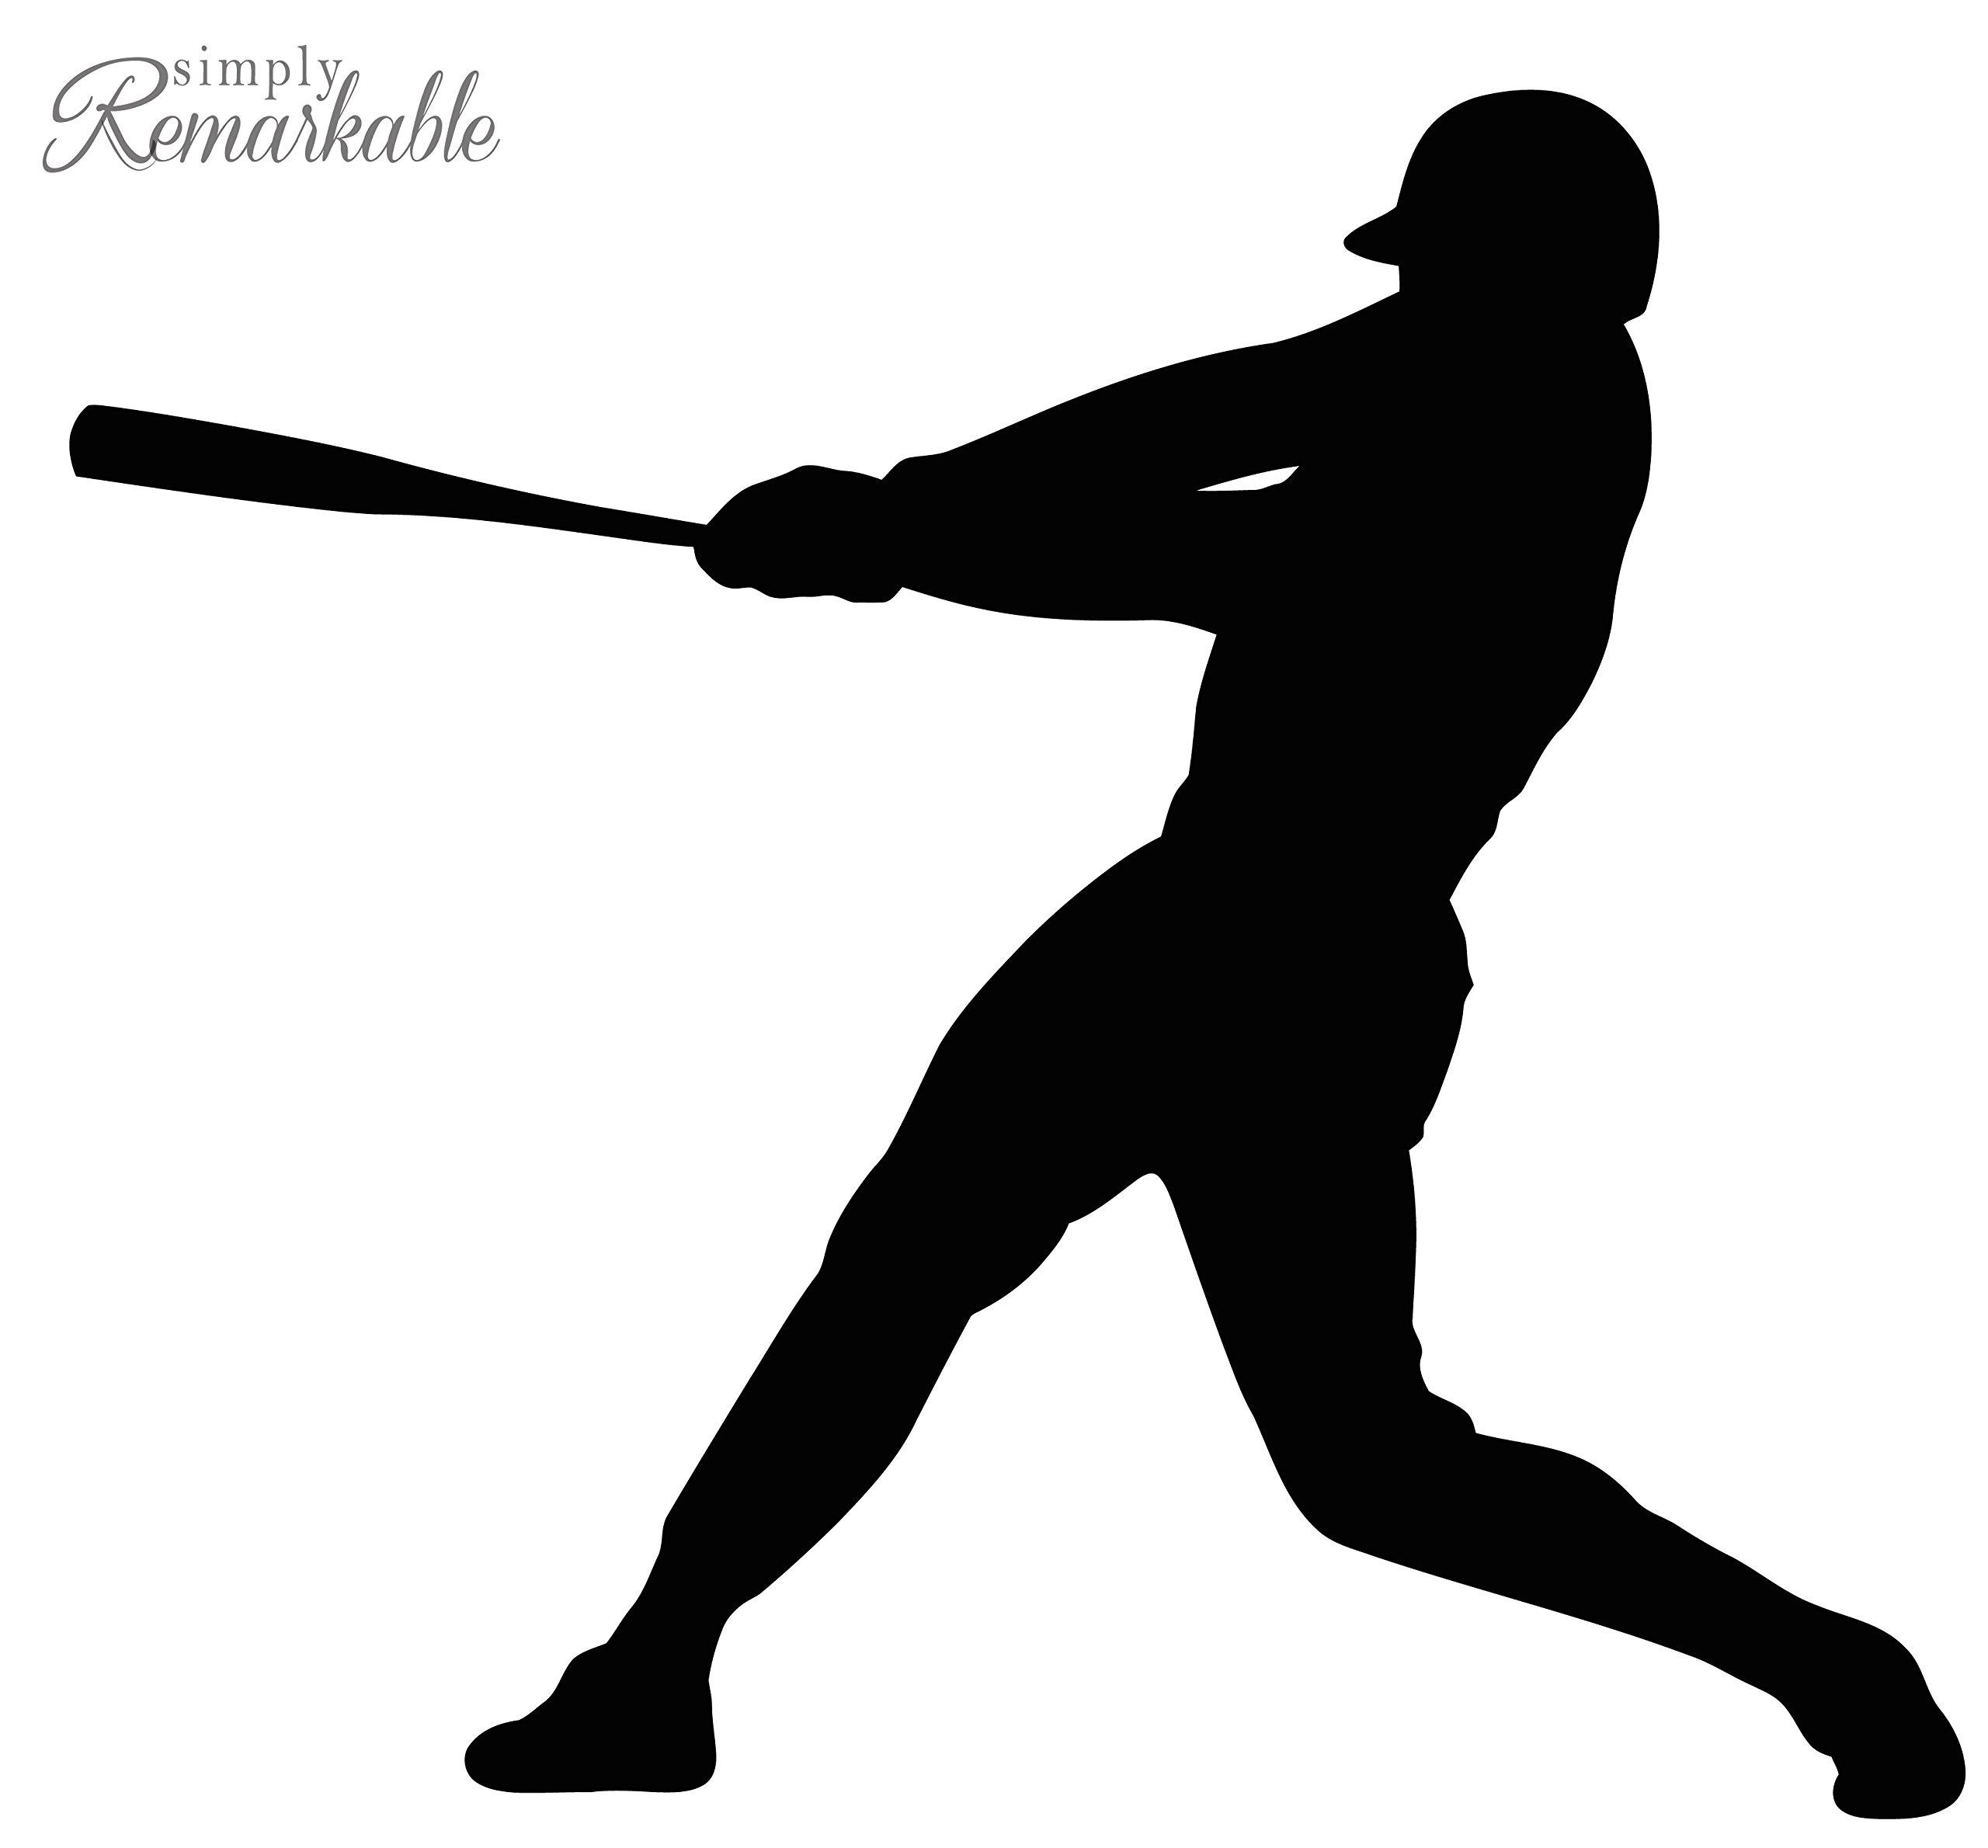 Vinilo Decorativo Pared [0UZFVCCU] baseball